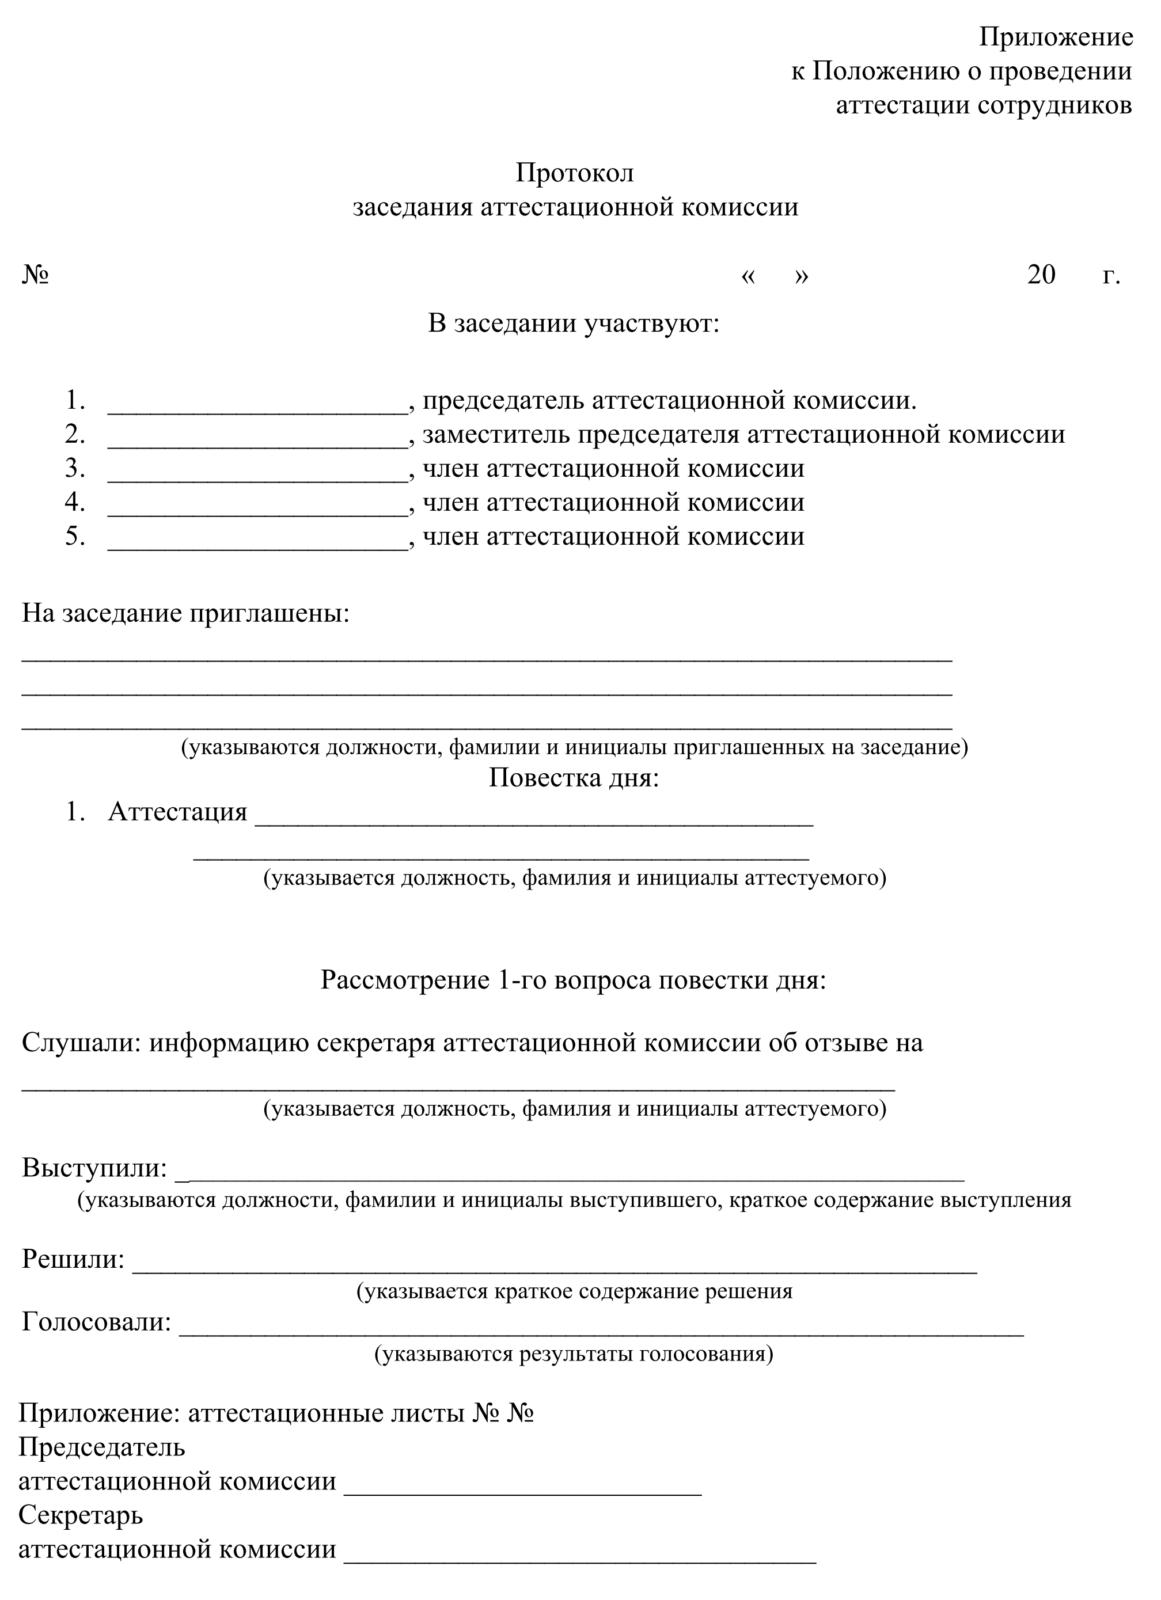 Протокол аттестации работников, образец